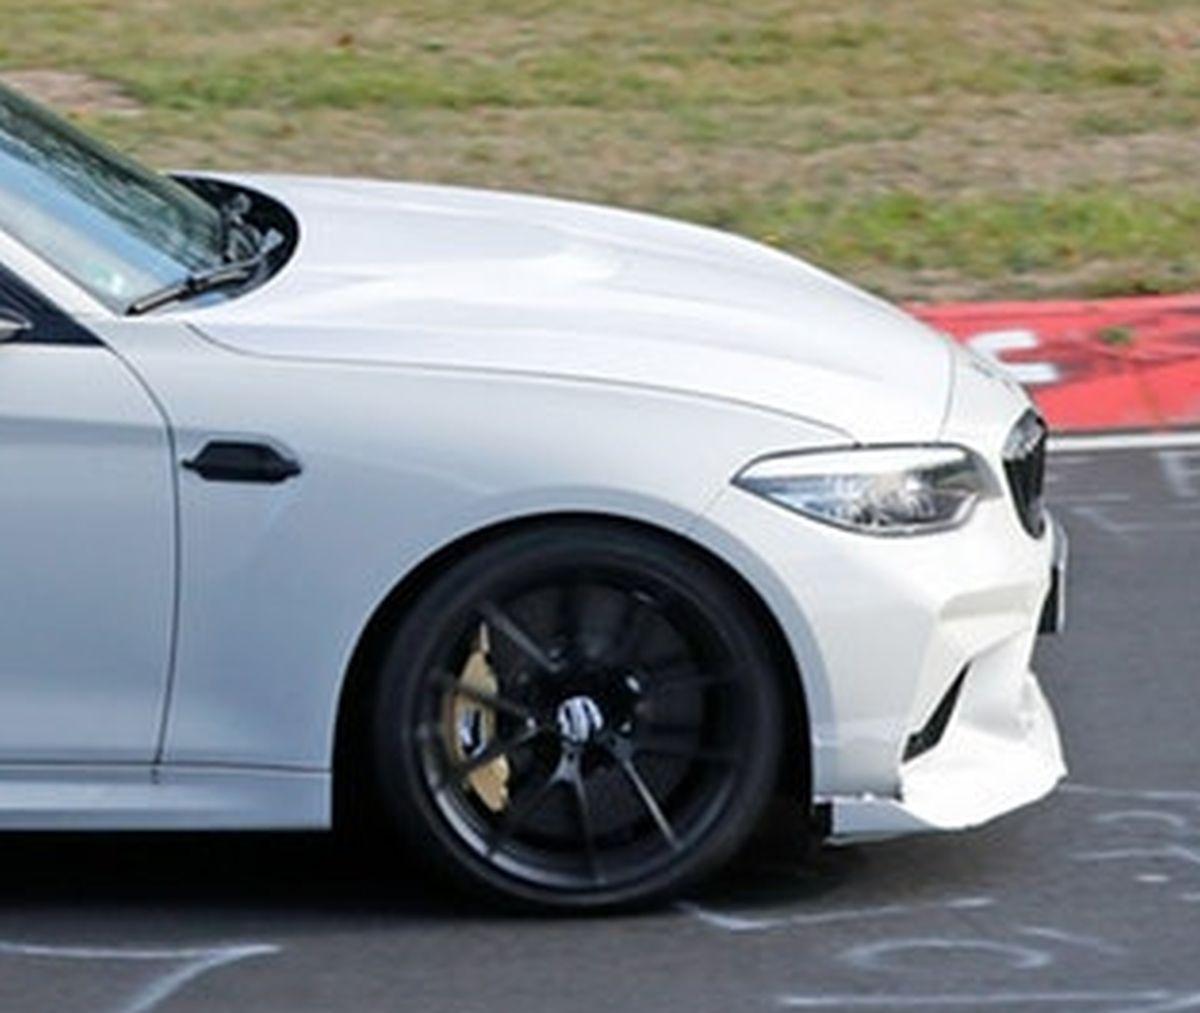 BMW M2 CS Spy Pics And Videos!